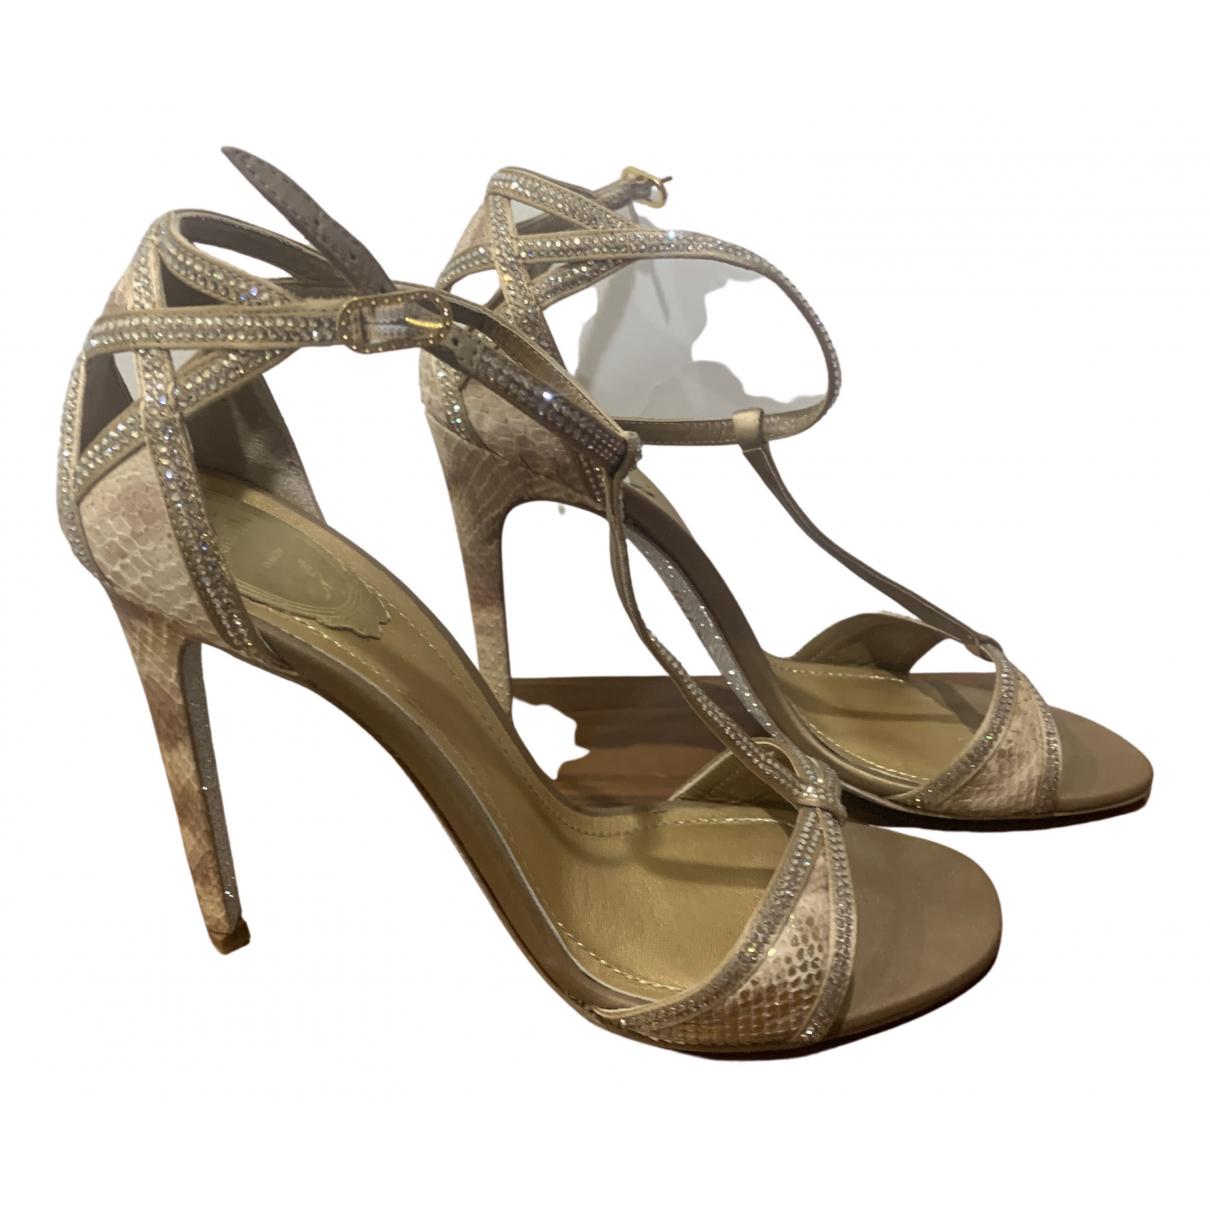 Rene Caovilla N Gold Leather Heels for Women 40 EU